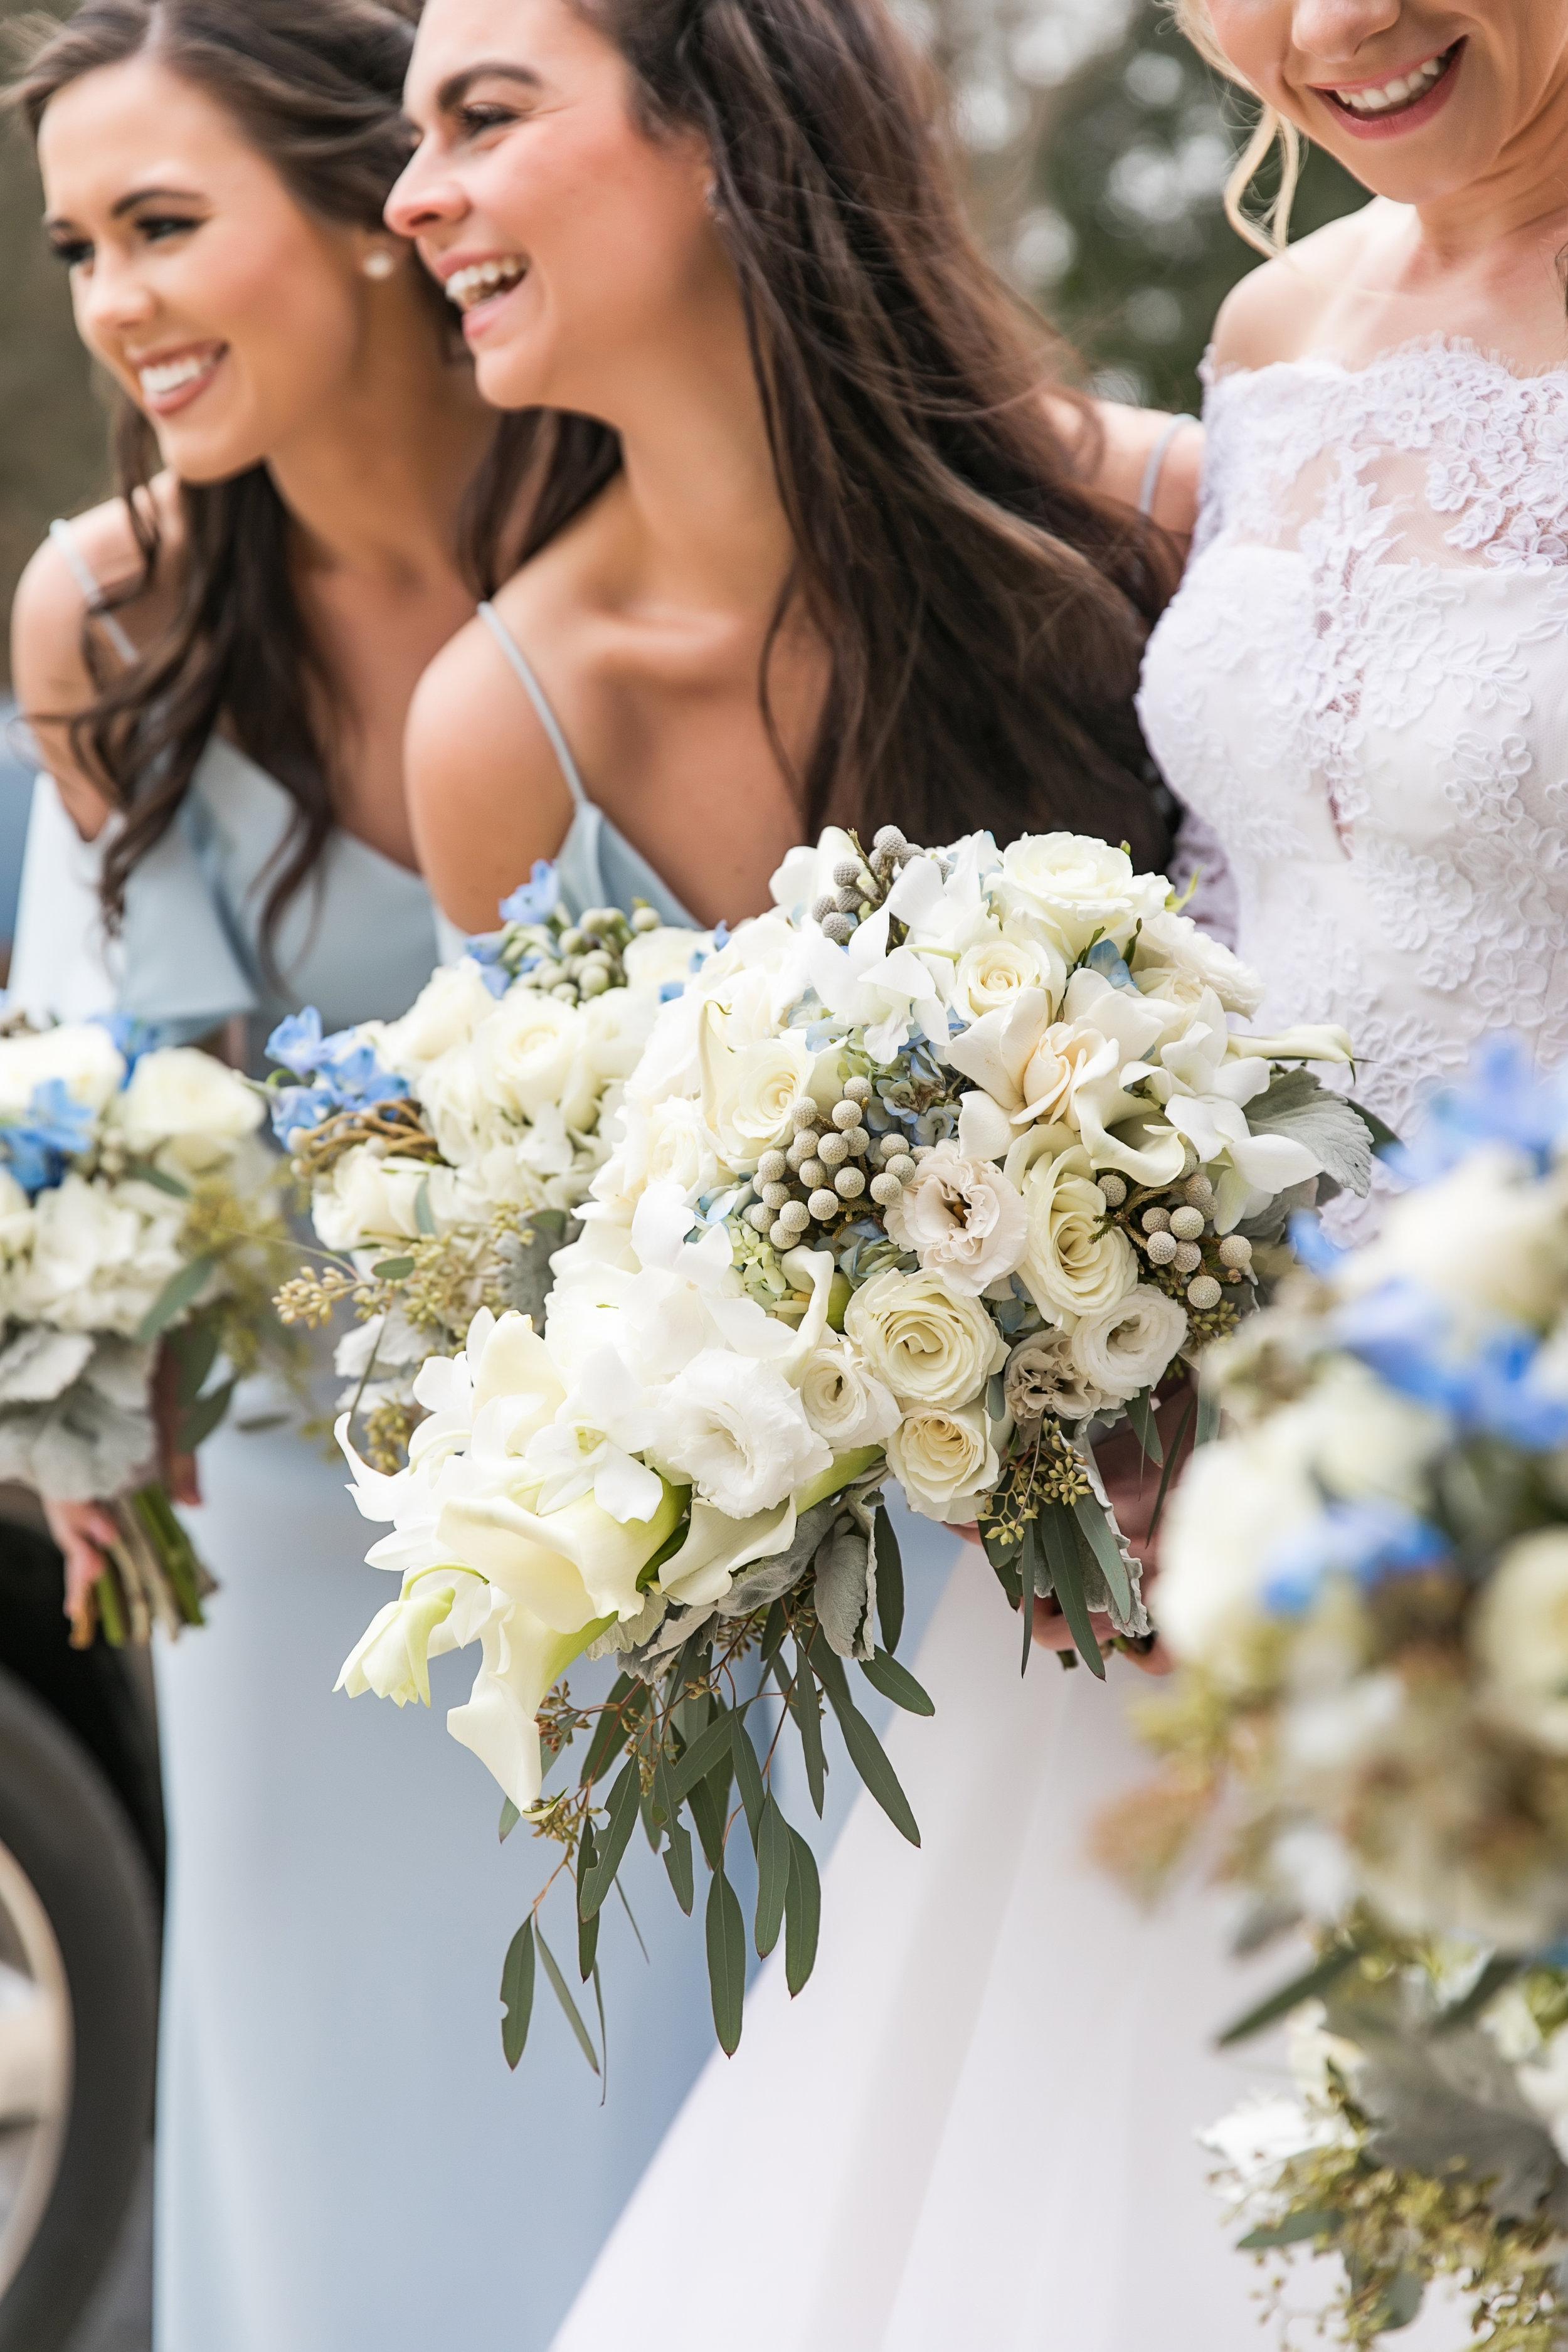 Slauer Events & Design - Marie + Bo | Greek Wedding at